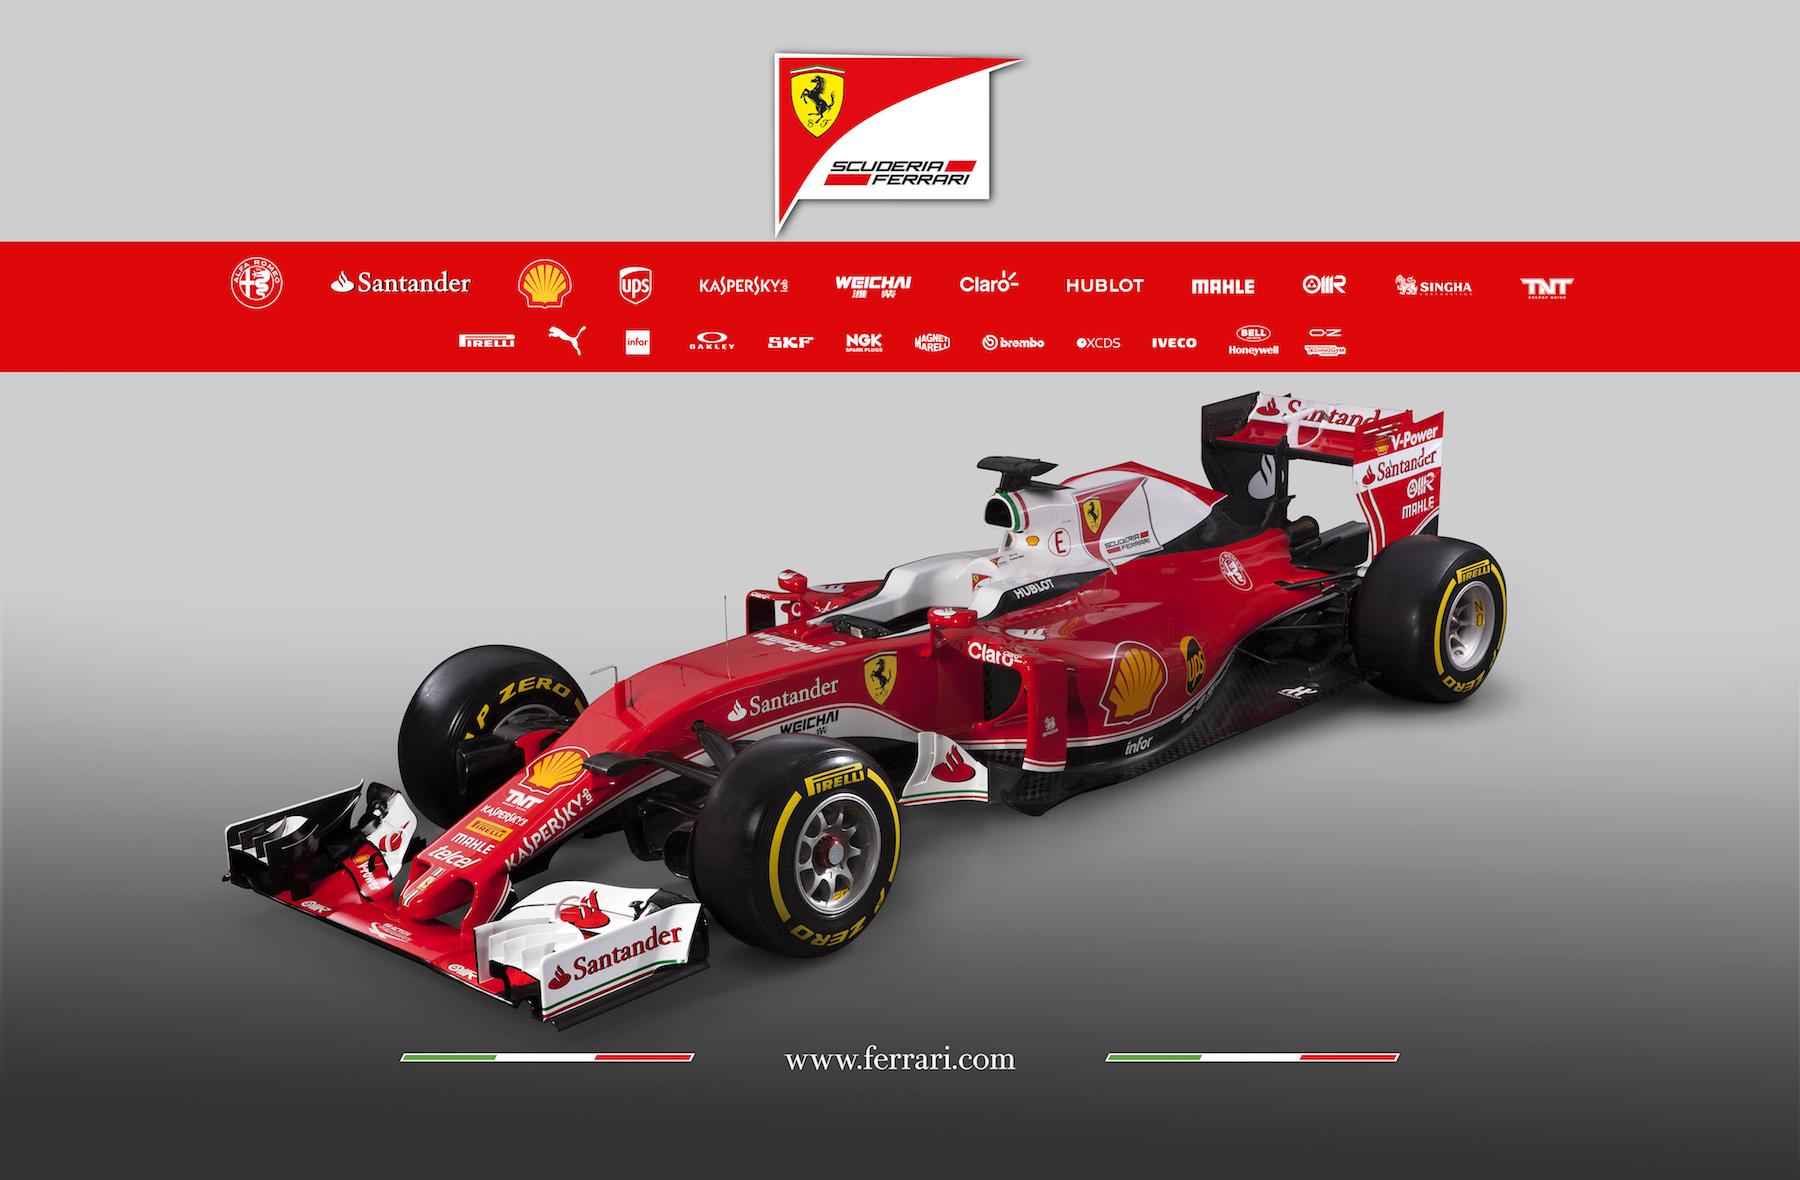 160001_new-SF16-h_3-4_2016_sponsor copy.jpg